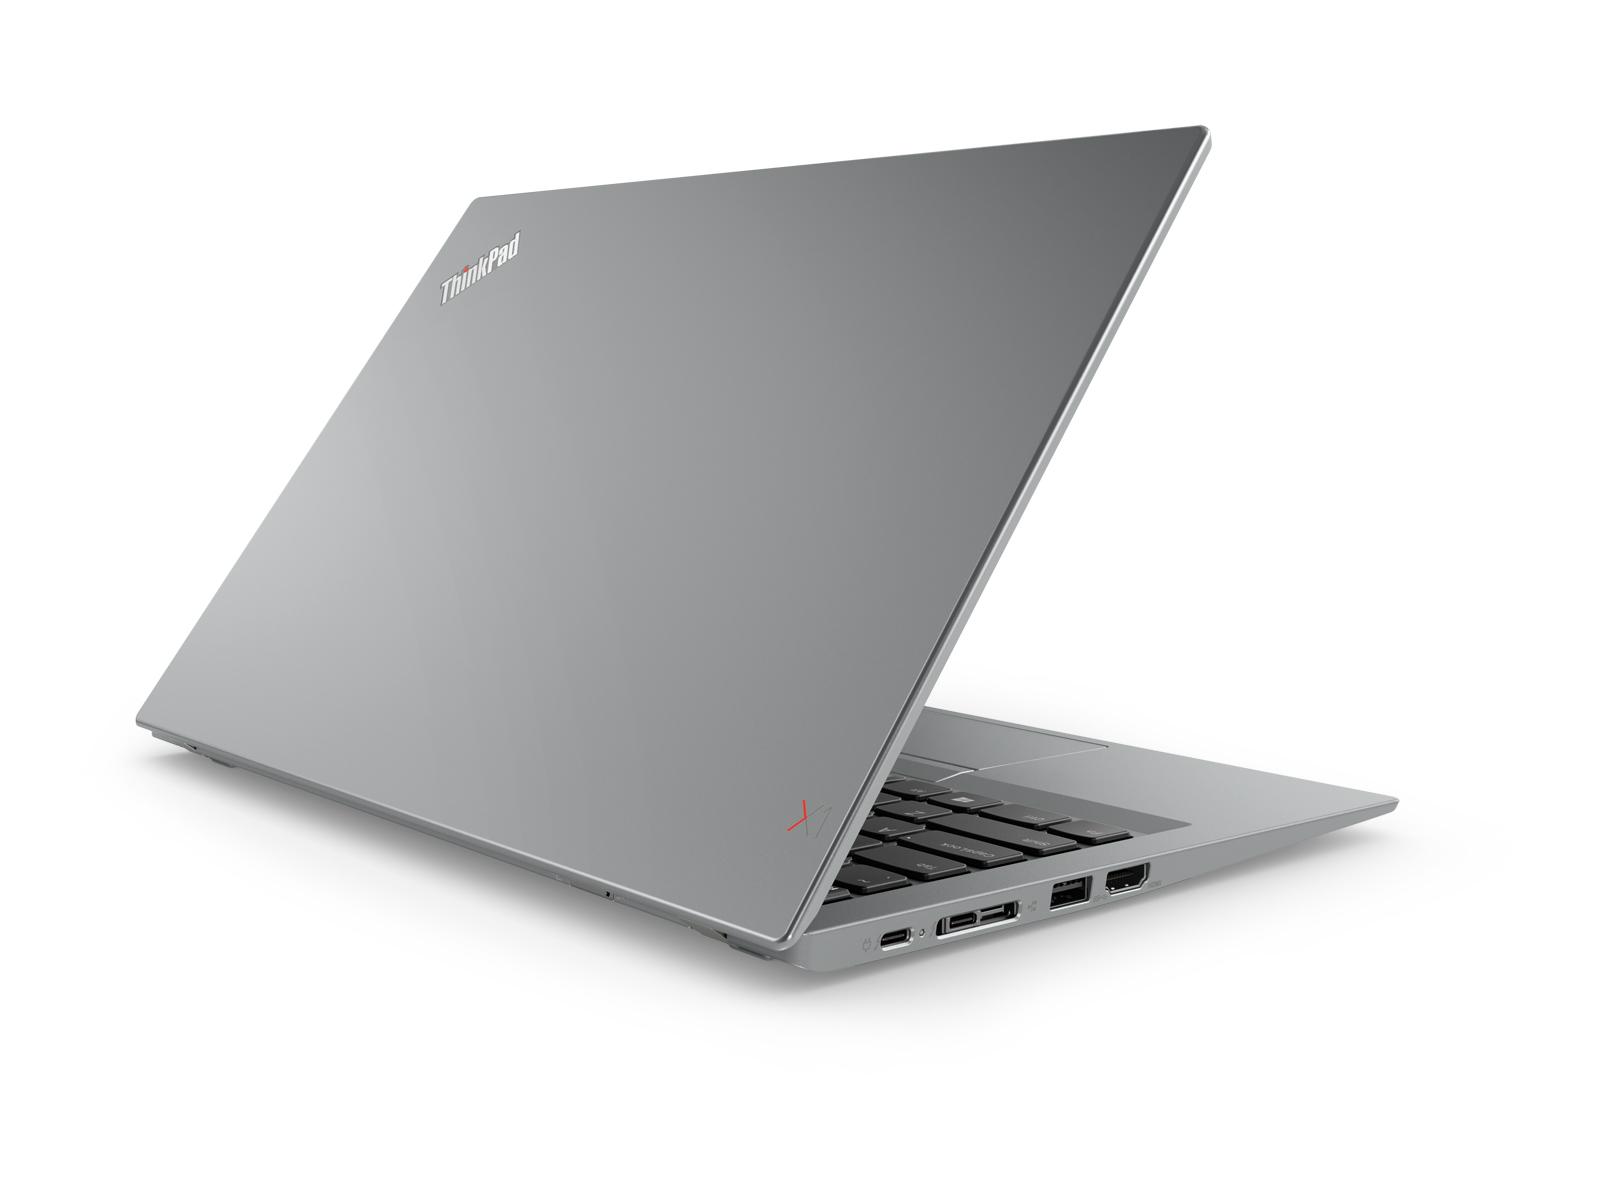 Lenovo ThinkPad X1 Carbon 2018 Series - Notebookcheck net External